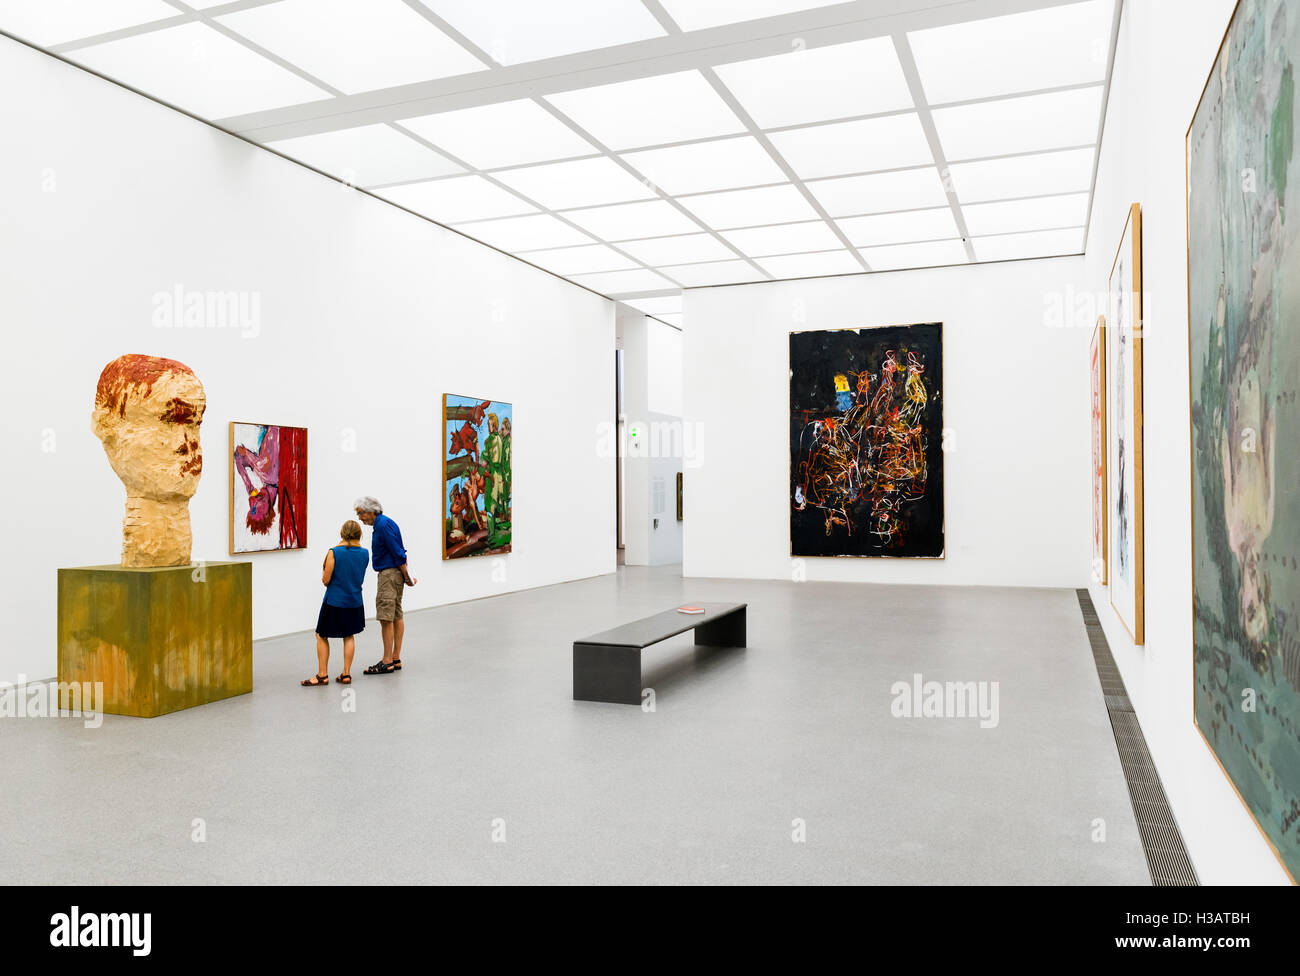 Interior of the Pinakothek der Moderne (Museum of Modern Art), Munich, Bavaria, Germany Stock Photo